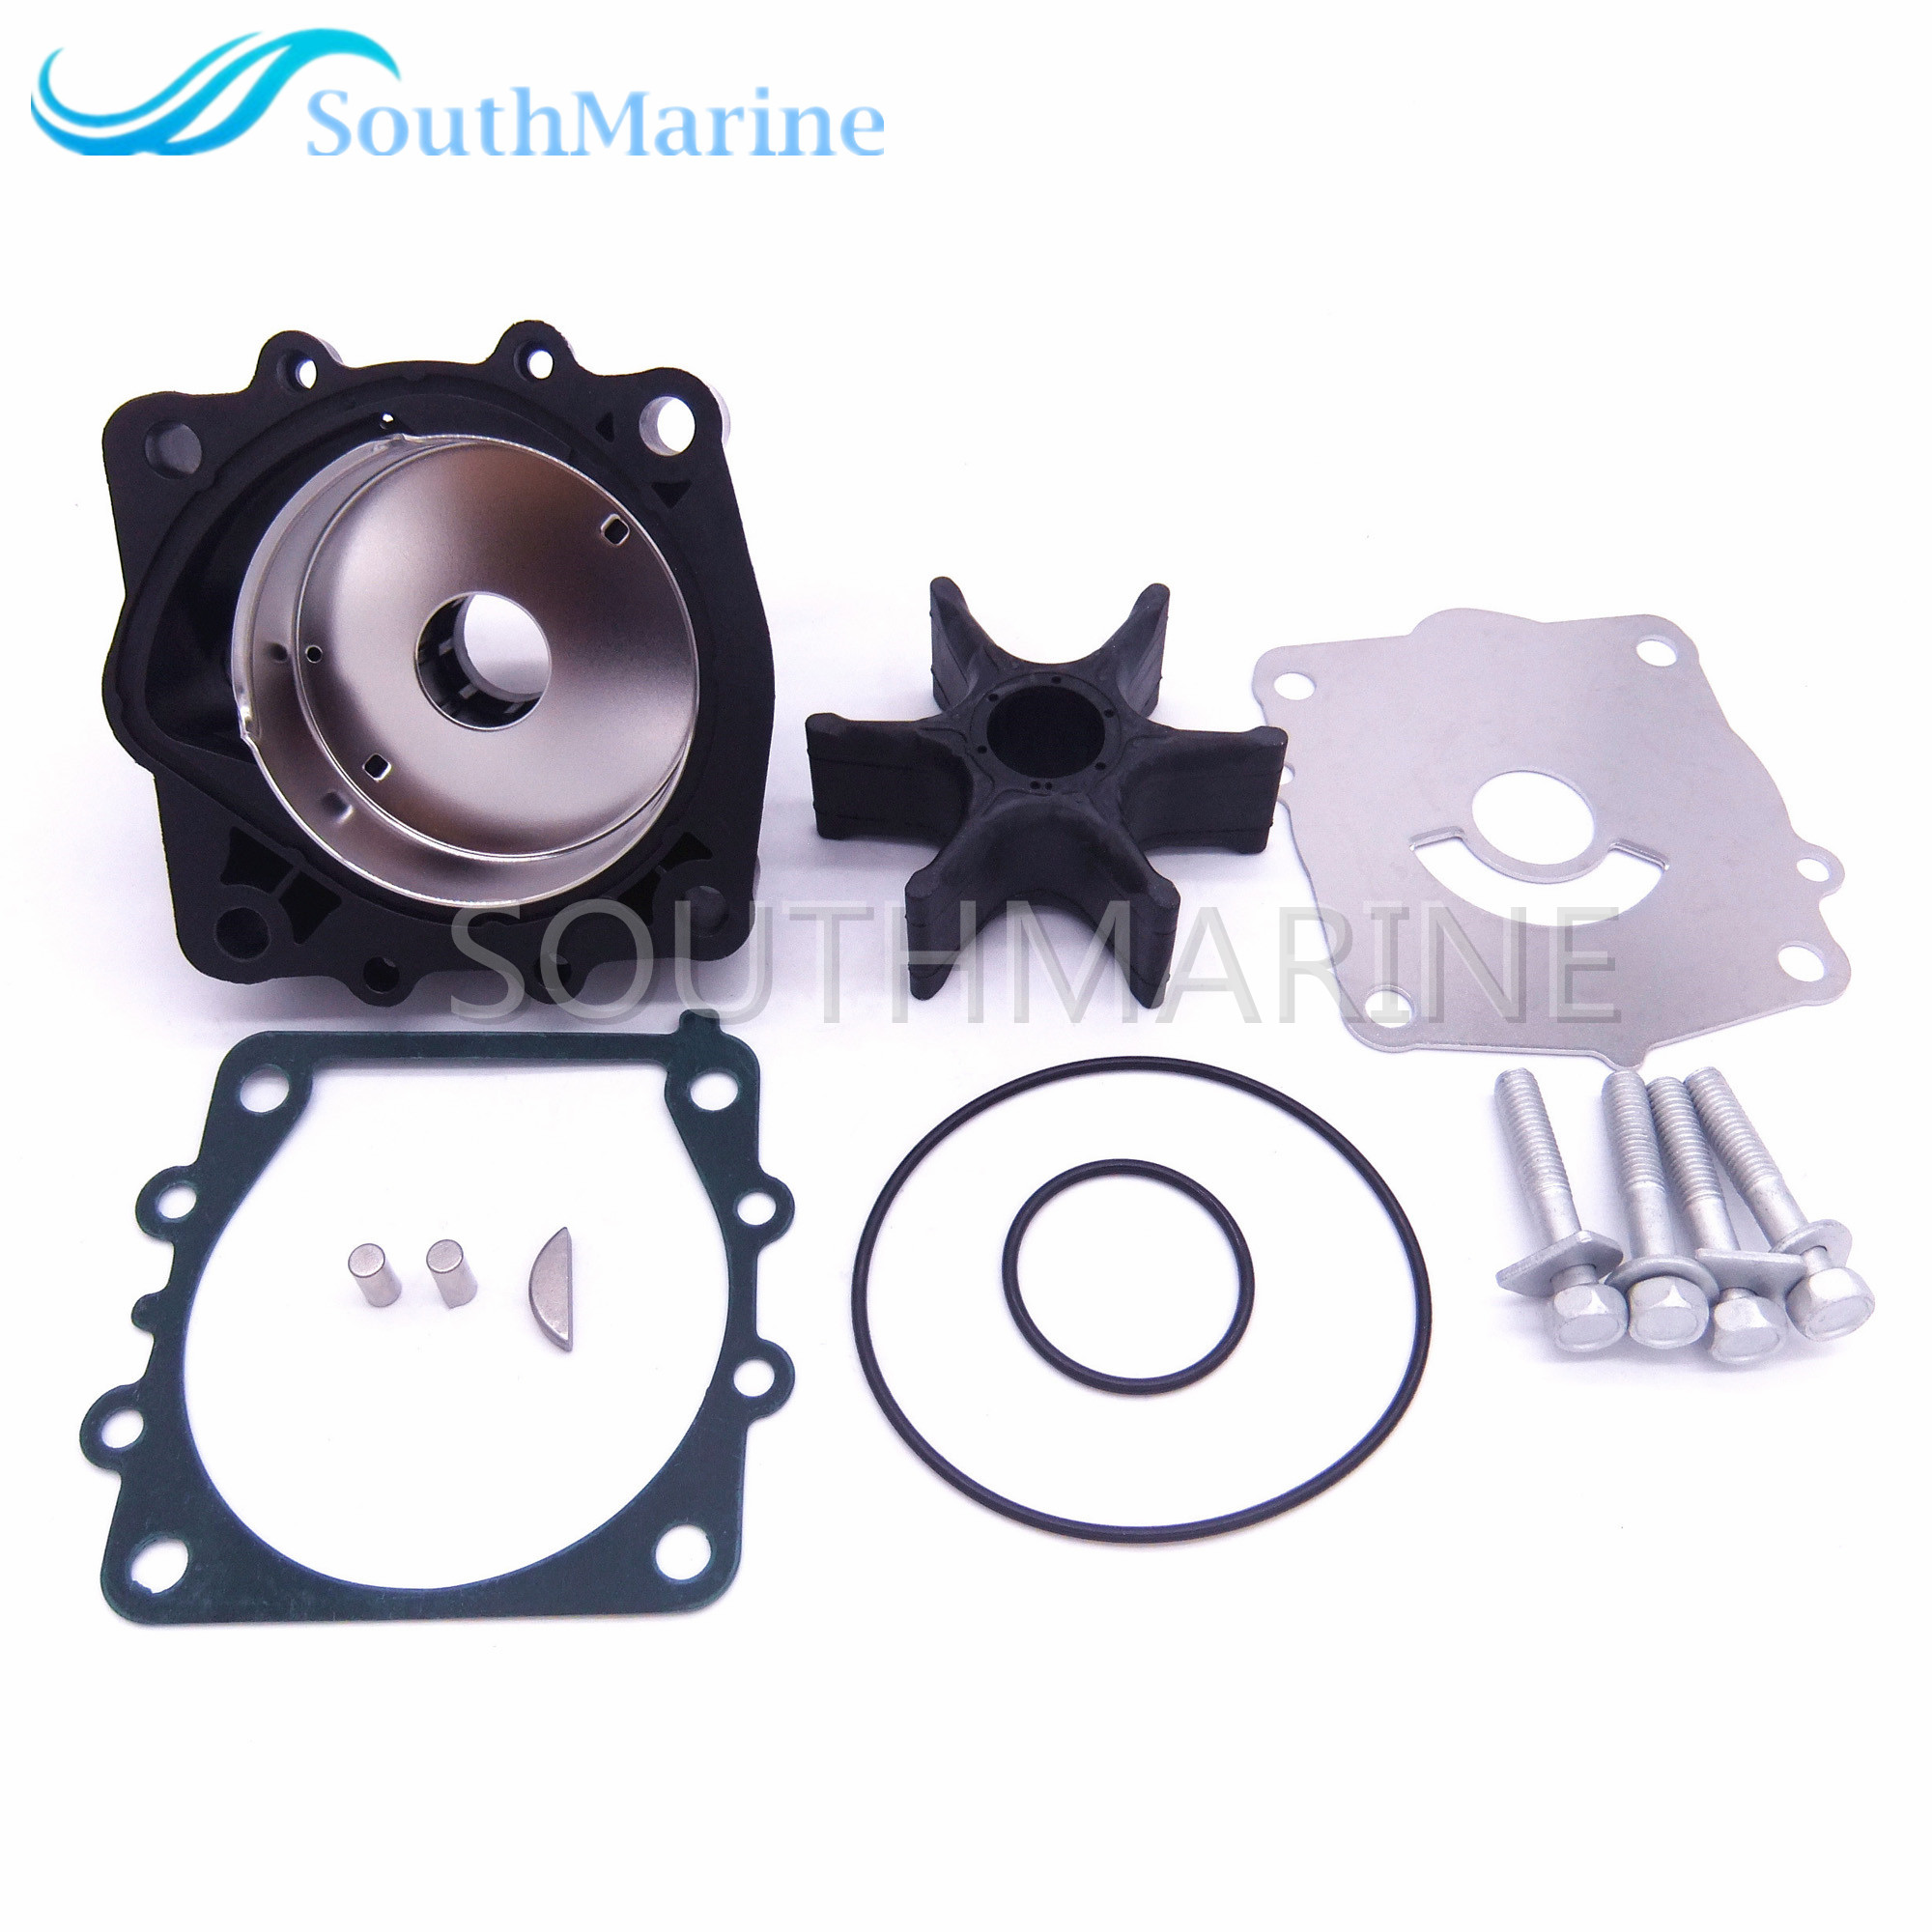 Outboard Motors 68V-W0078 68V-W0078-00 Water Pump Kit For Yamaha 115HP F115 Boat , Free Shipping